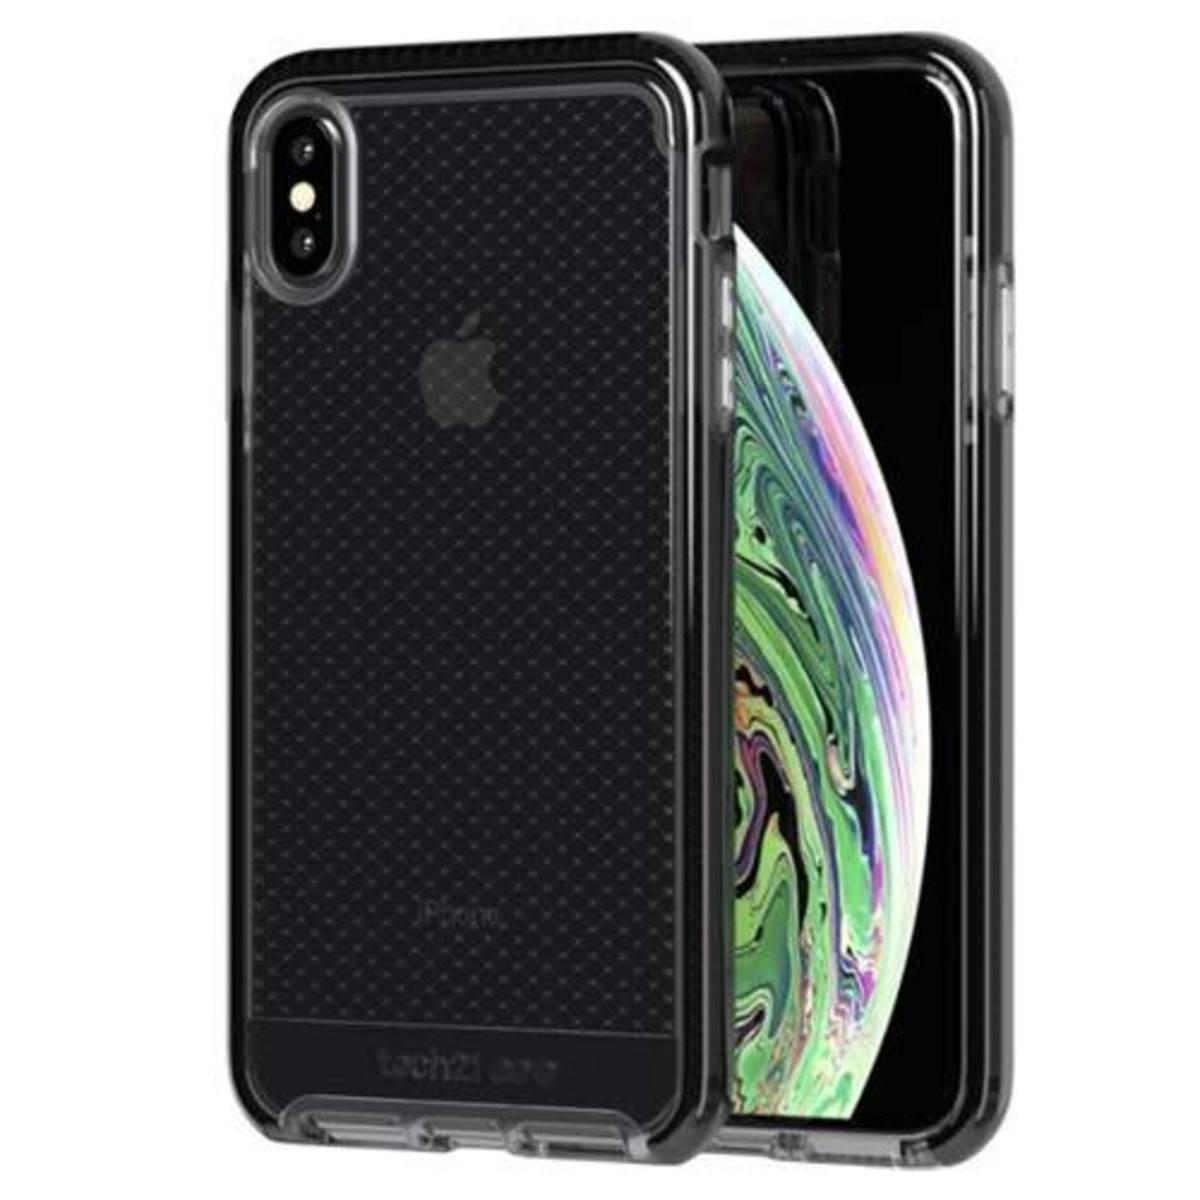 Evo Check iPhone XS MAX Case - Smokey Black